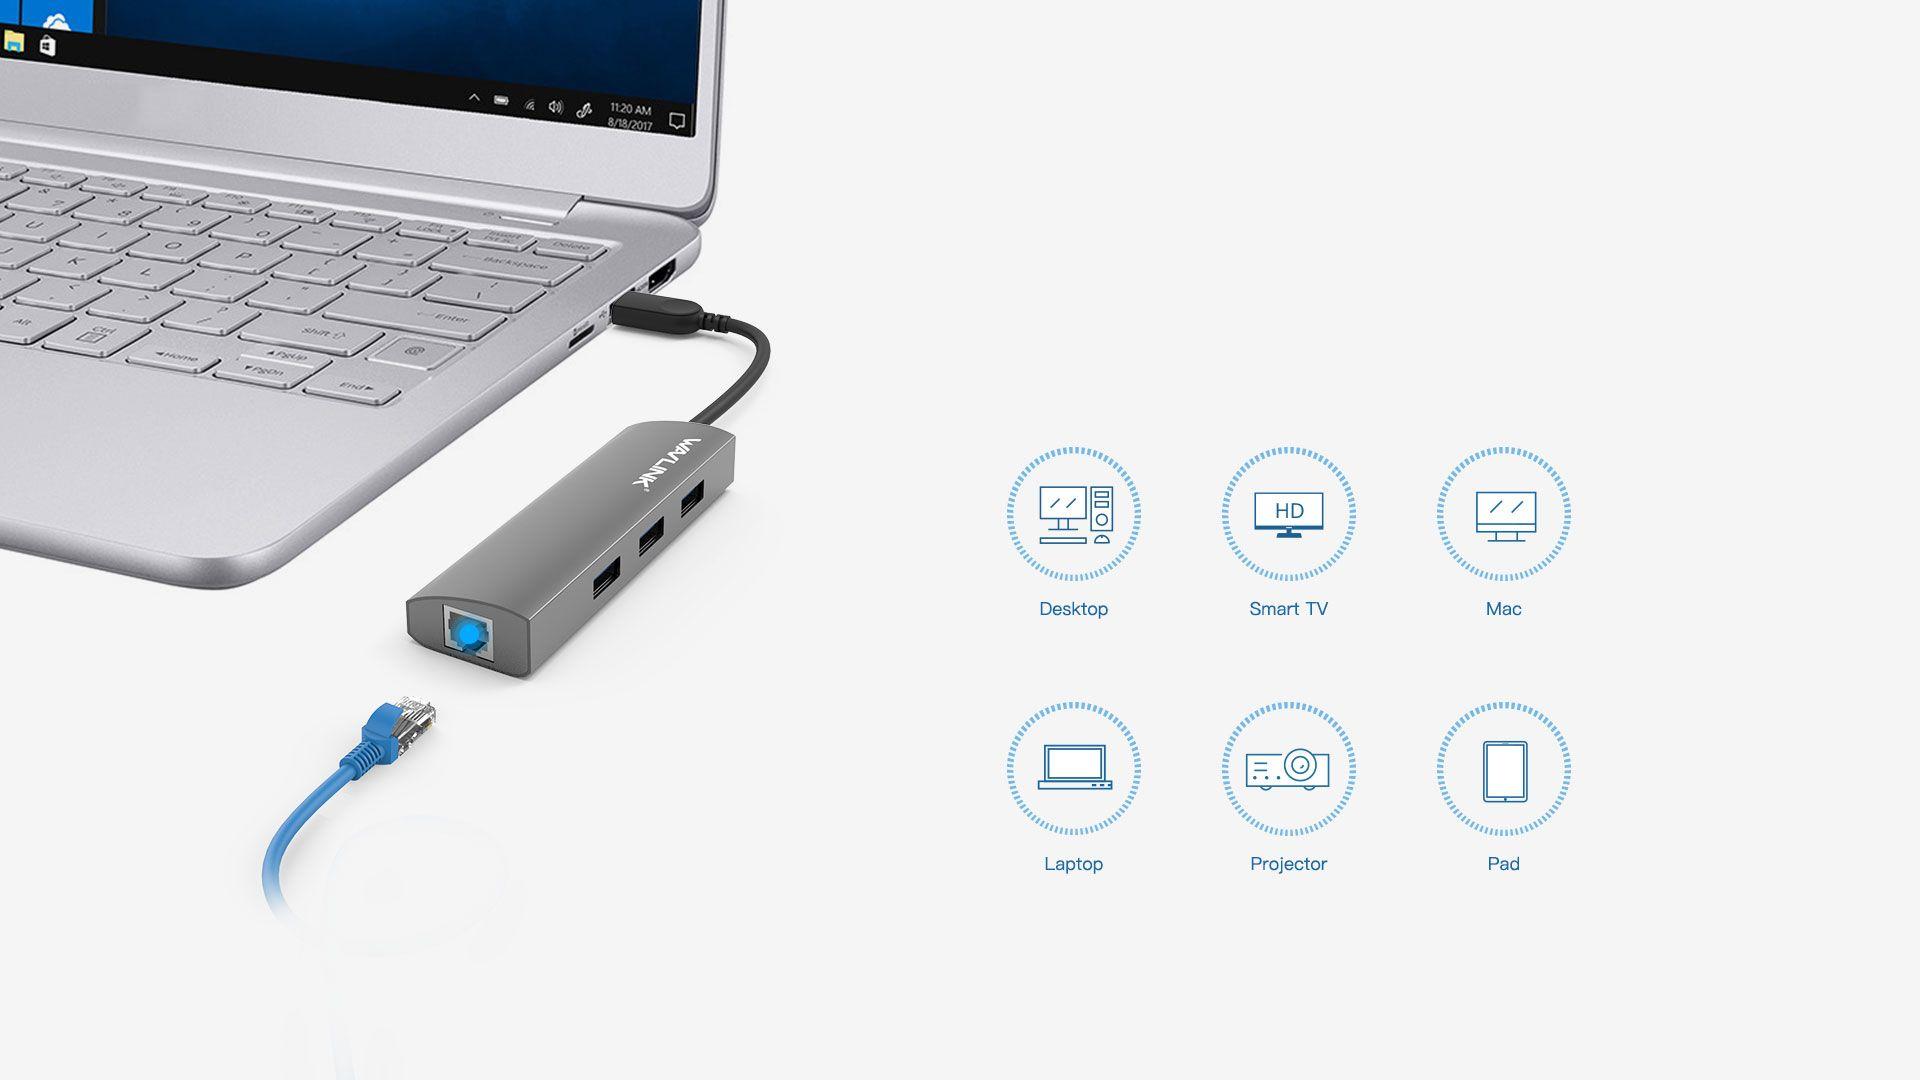 WAVLINK USB 3.0 4-PORT HUB WITH GIGABIT ETHERNET 3 6